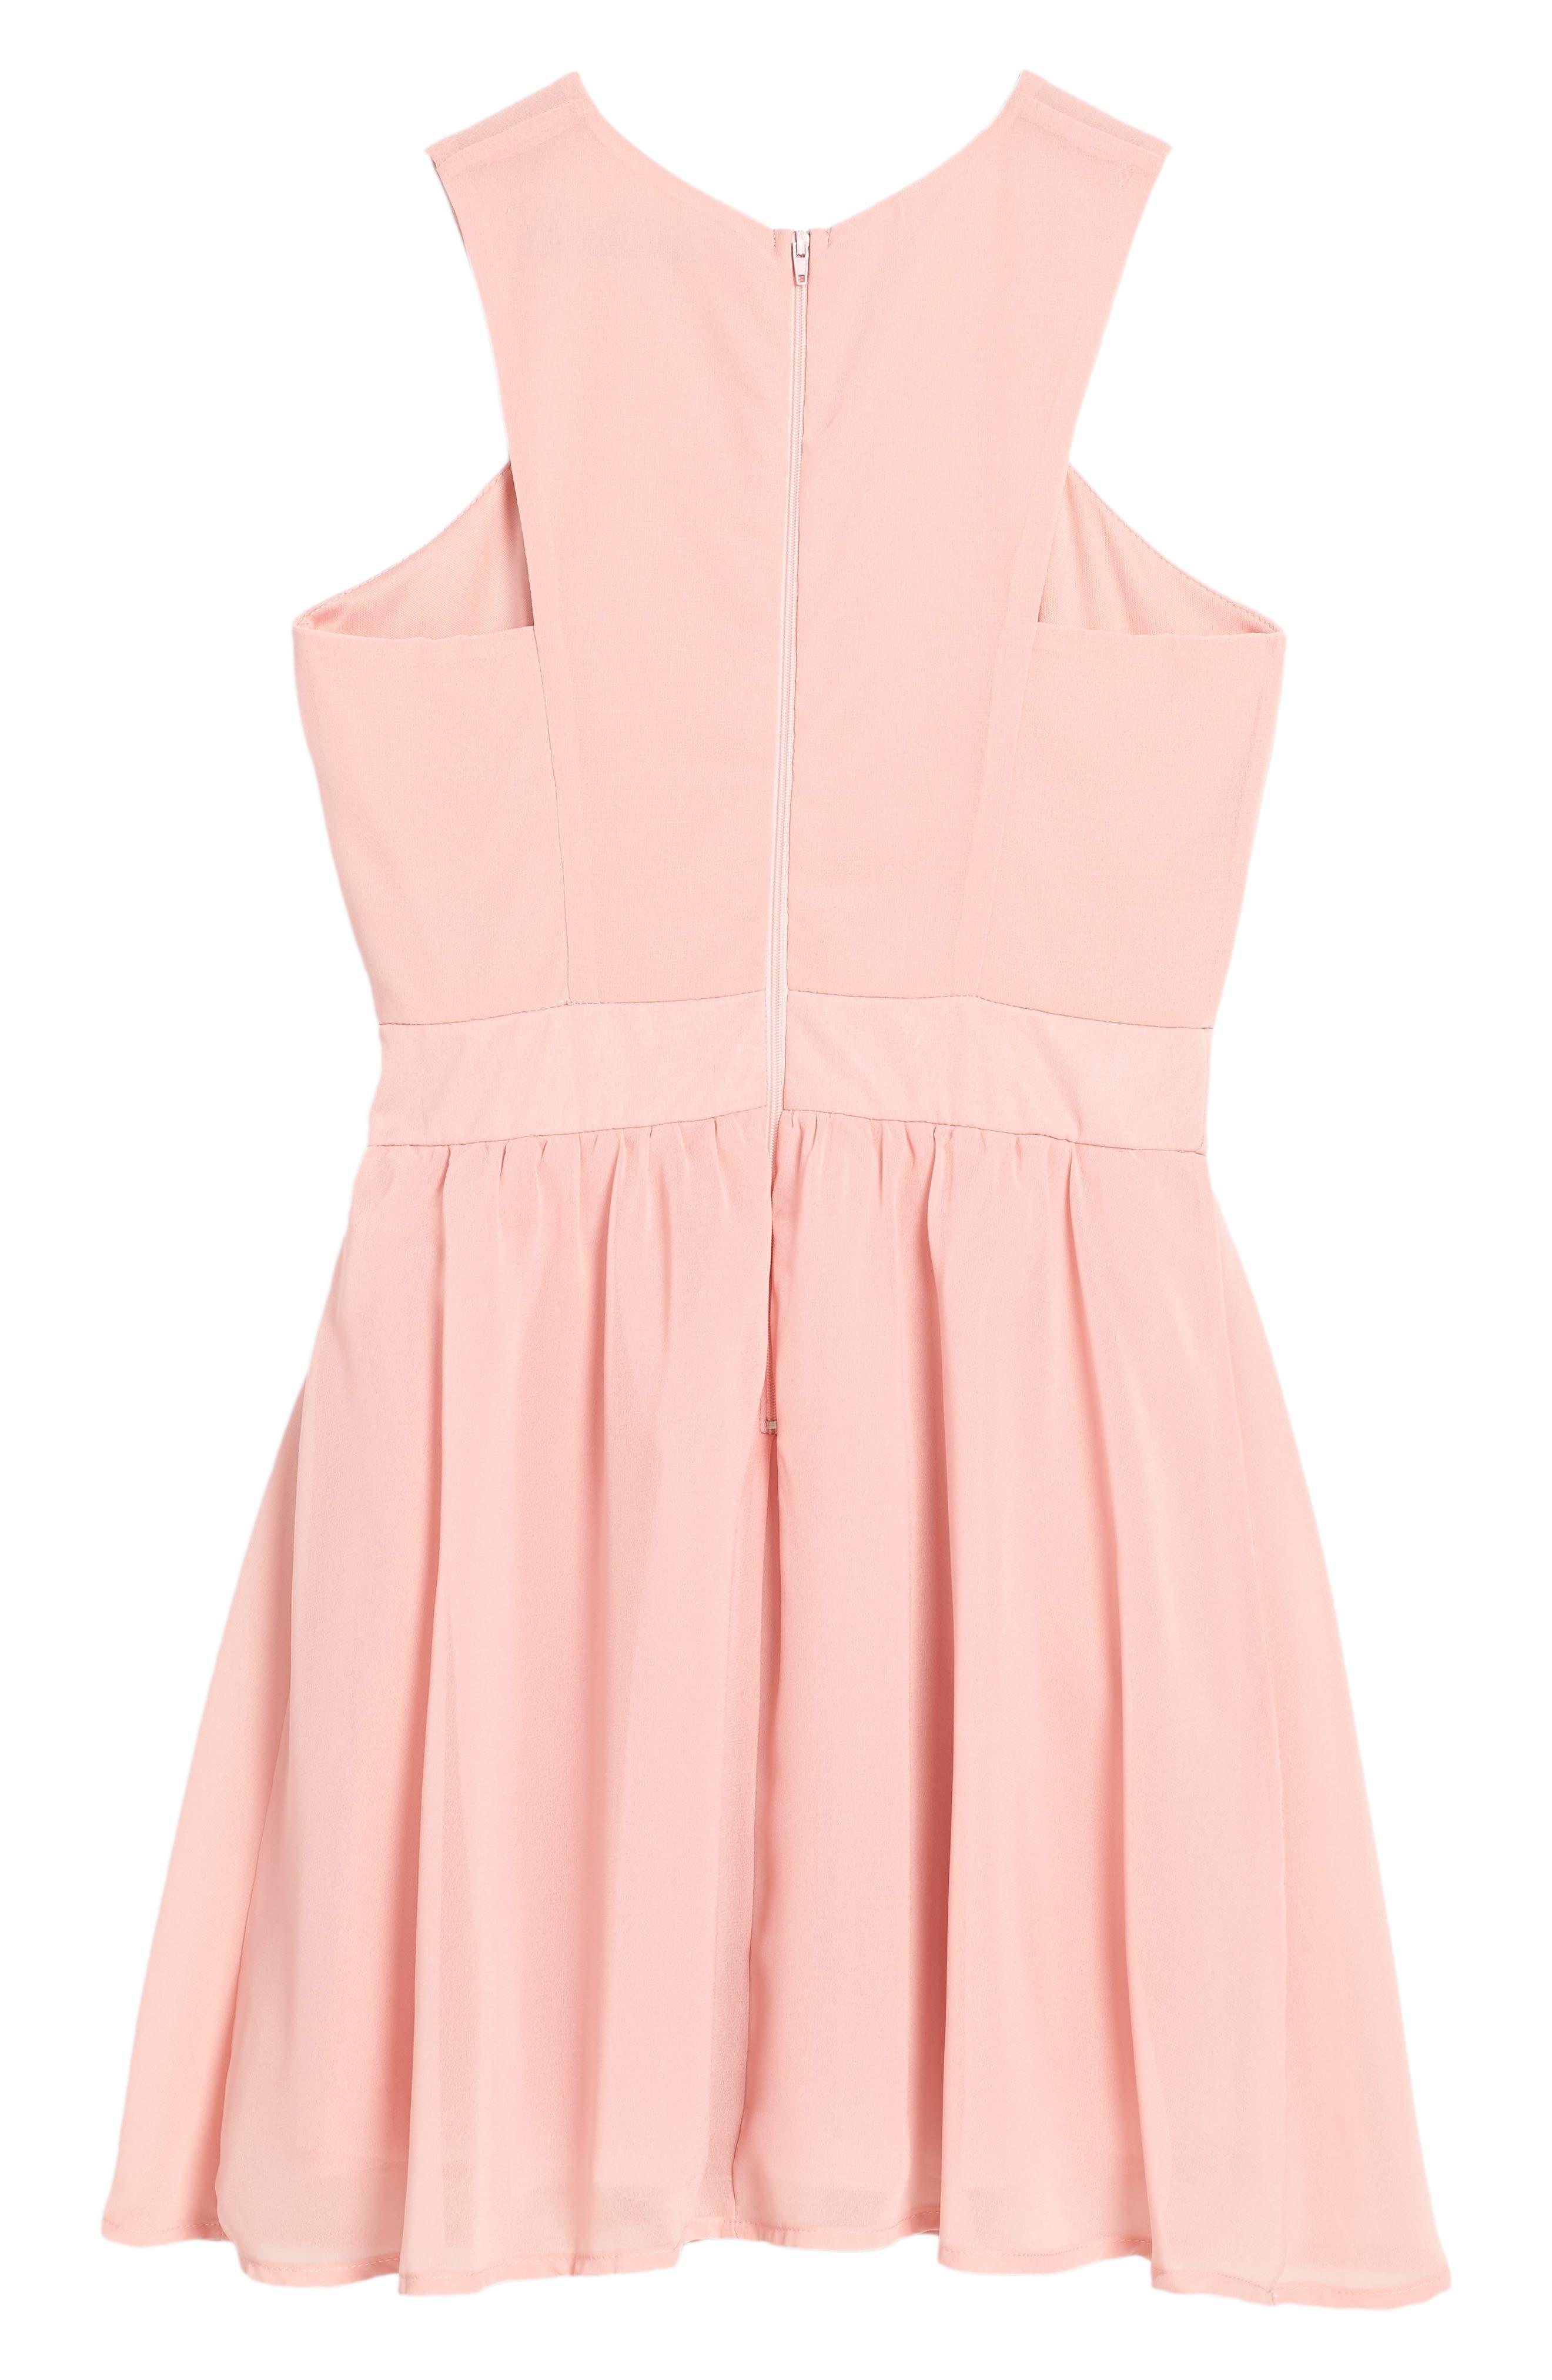 Alternate Image 2  - Penelope Tree Camilla Sleeveless Dress (Big Girls)